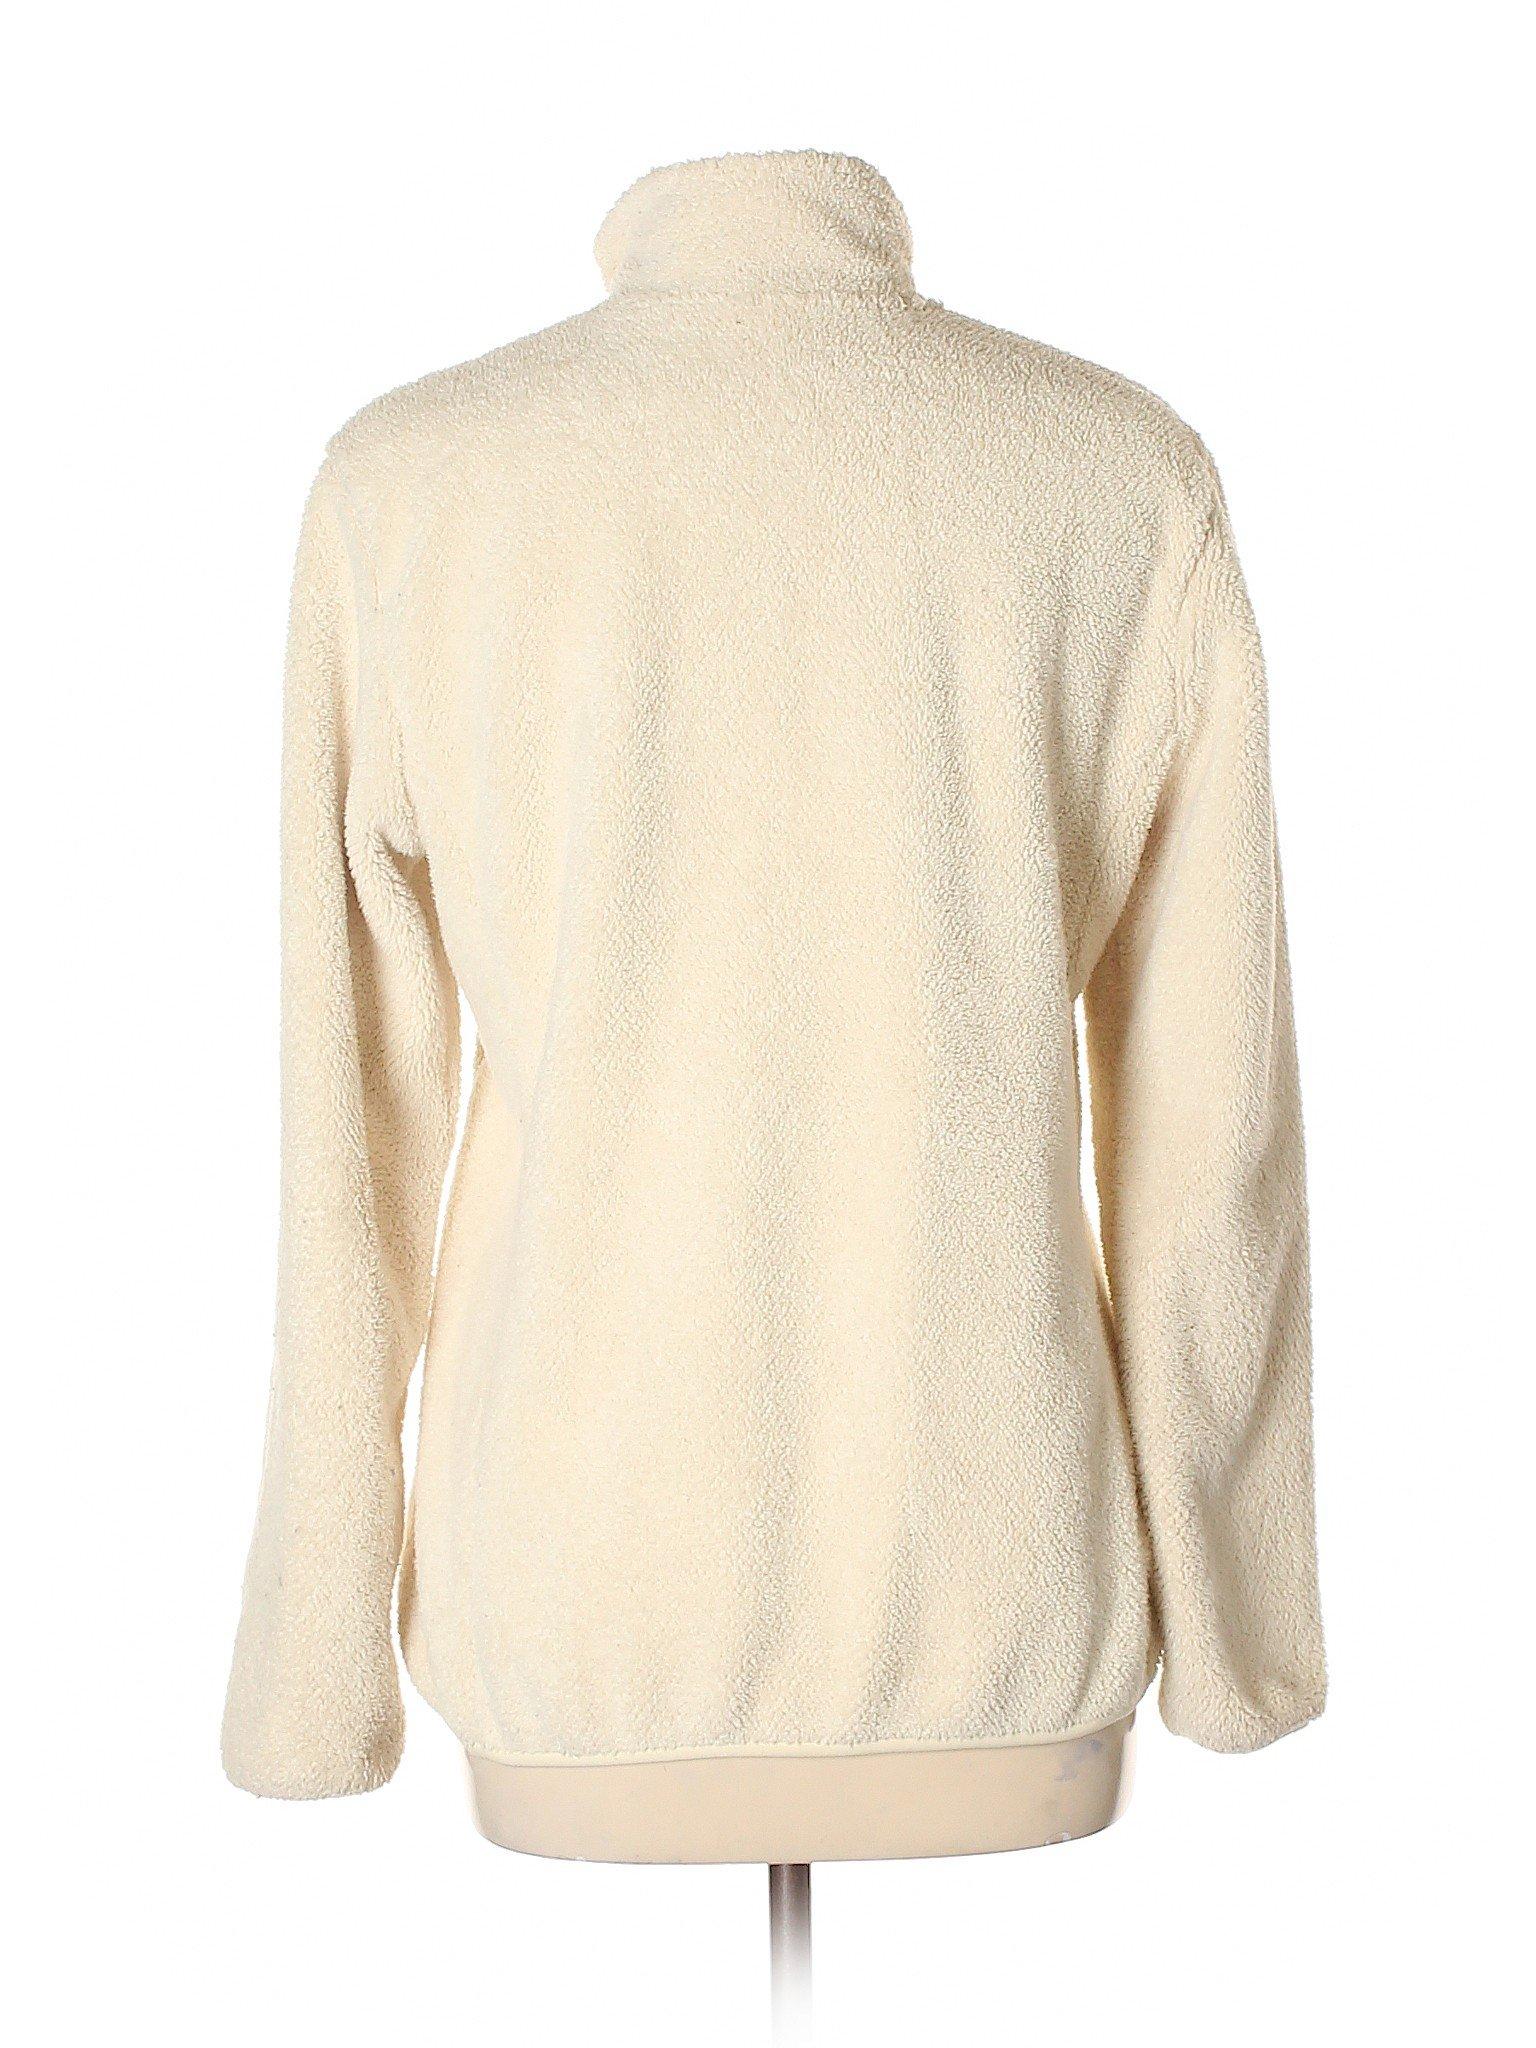 Boutique Uniqlo winter Uniqlo Boutique Uniqlo Boutique Uniqlo winter Fleece Fleece Boutique winter winter Fleece wvSzt